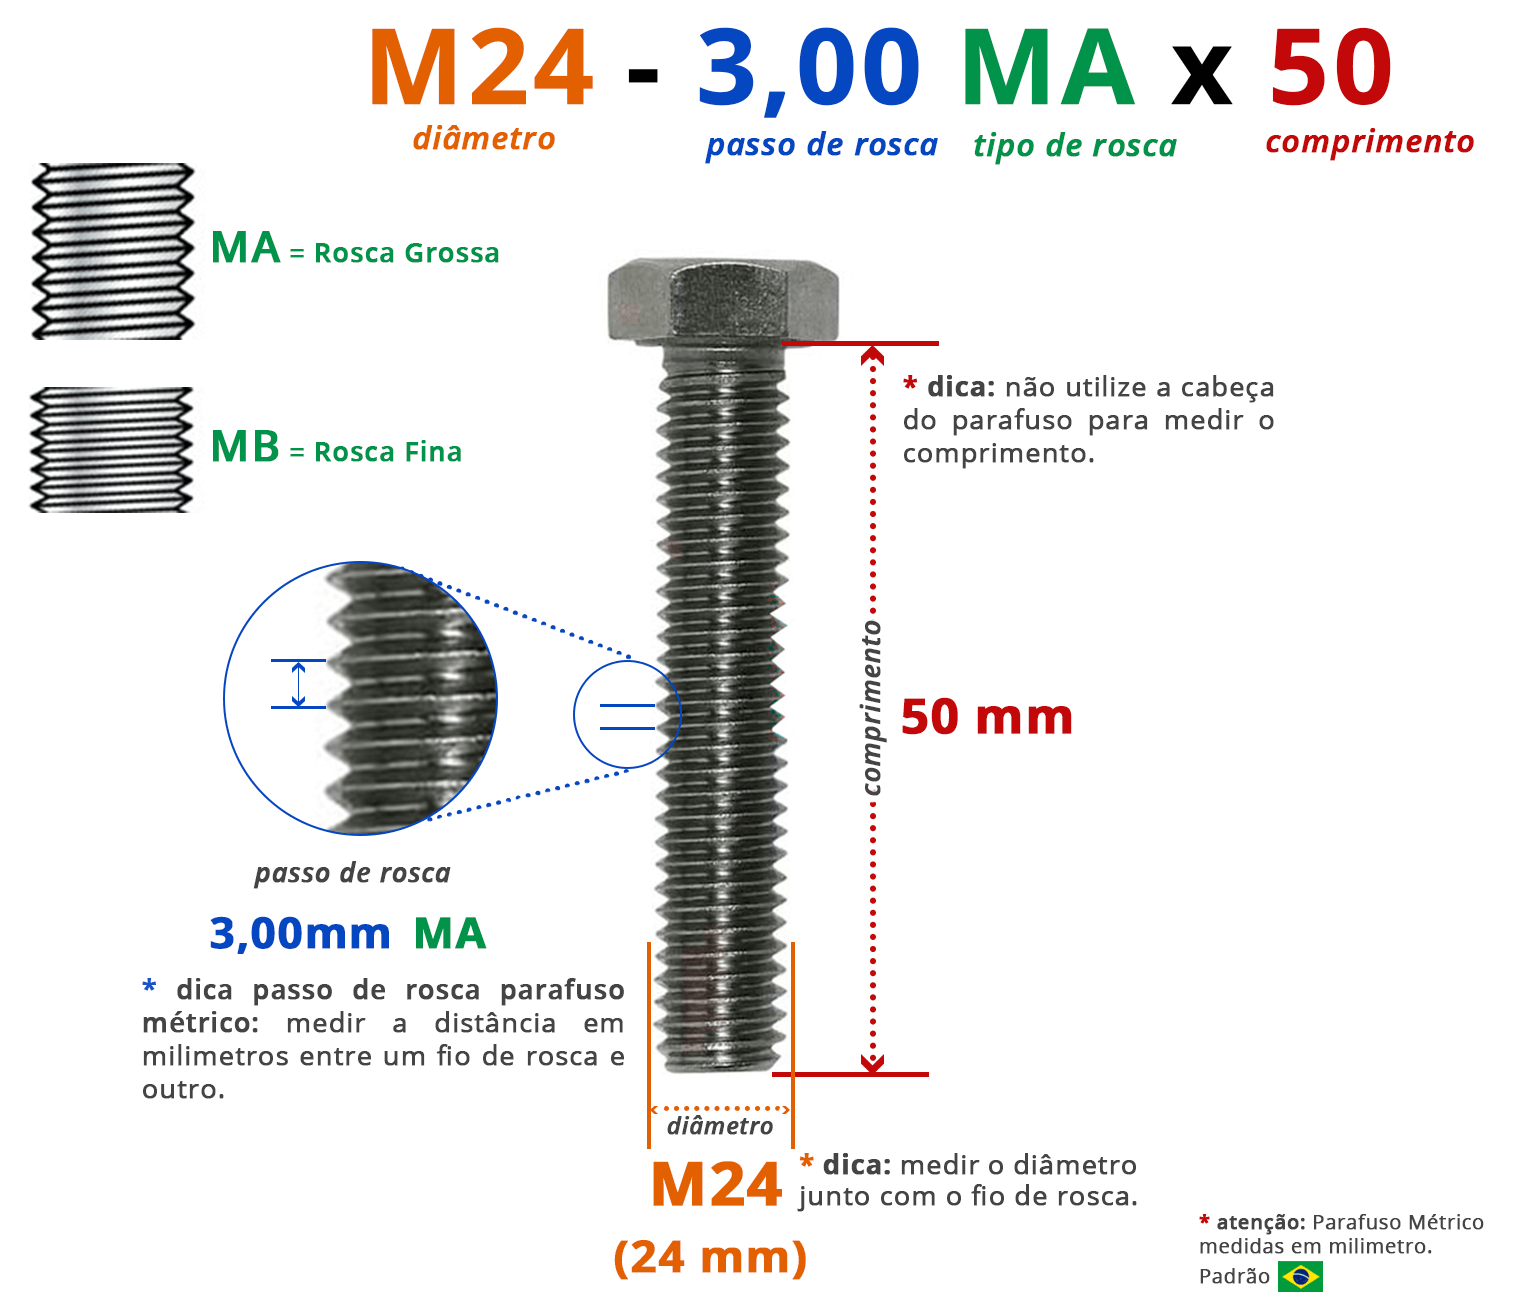 PARAFUSO SEXTAVADO ROSCA INTEIRA M24 3,00 MA X 50 DIN 933 INOX A4